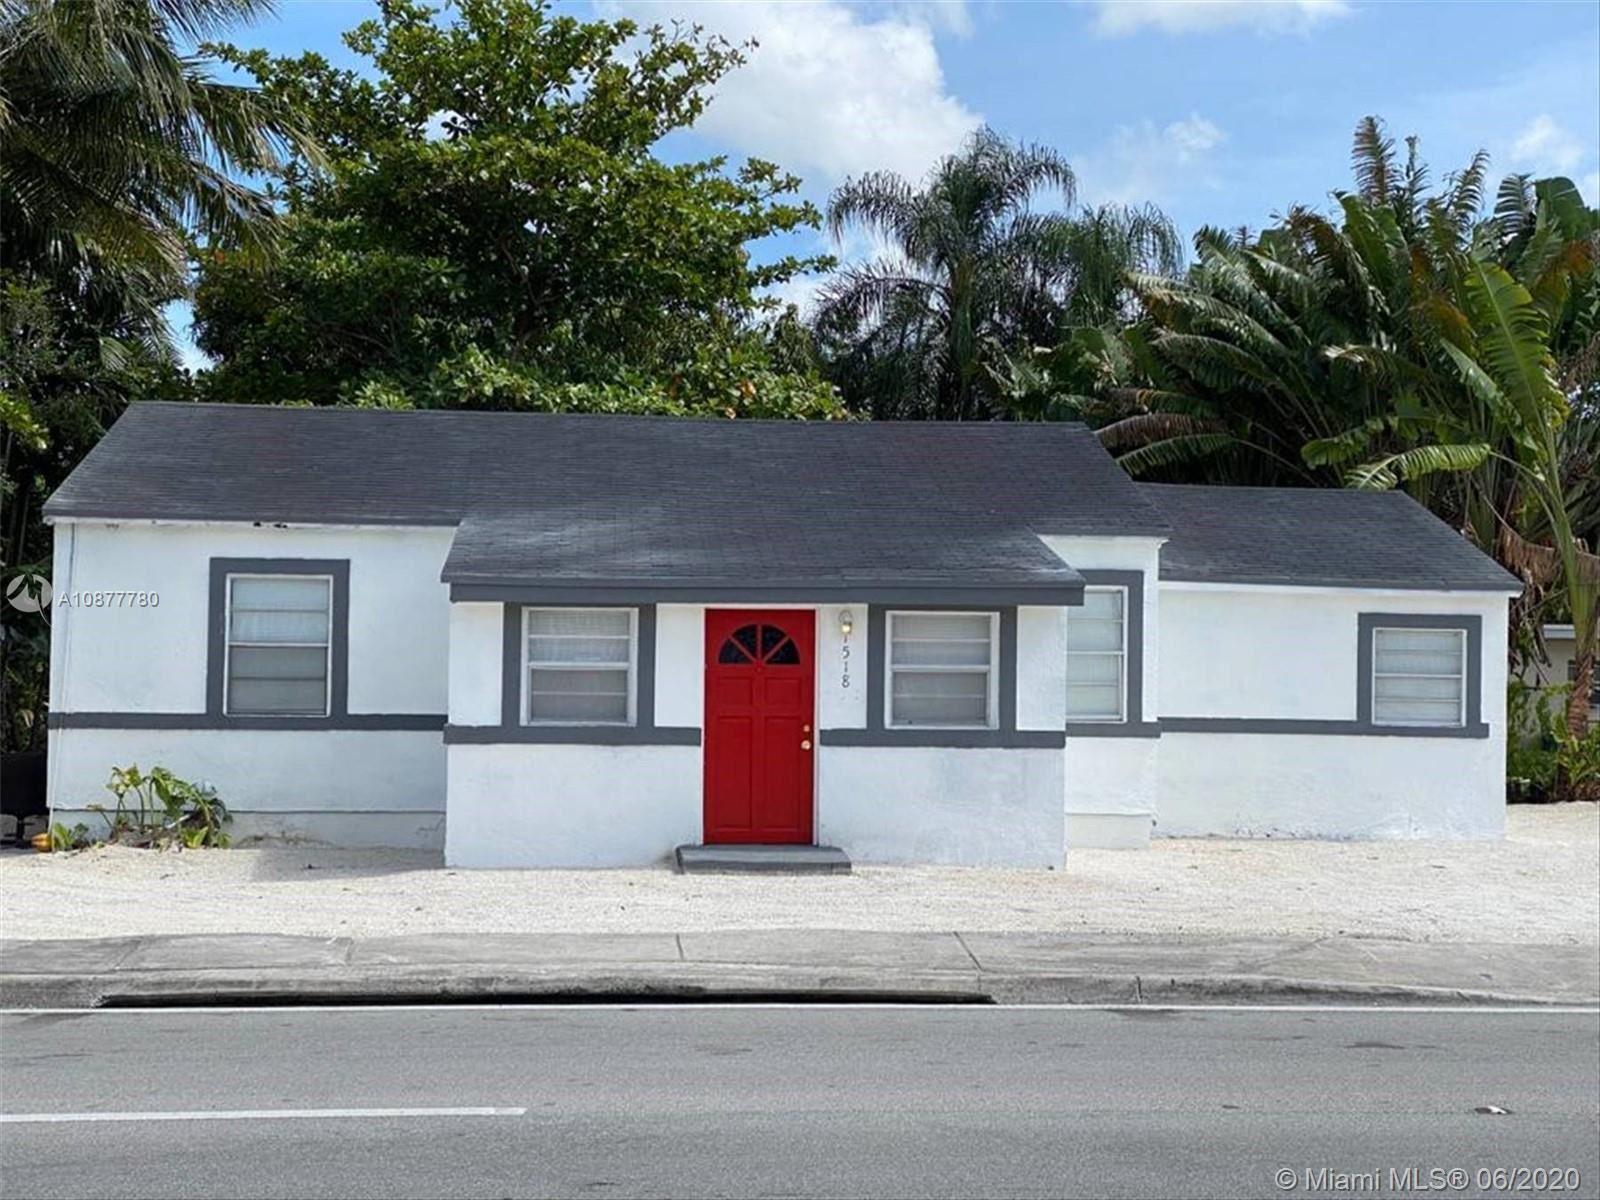 1518 NW 103rd St, Miami, FL 33147 - #: A10877780